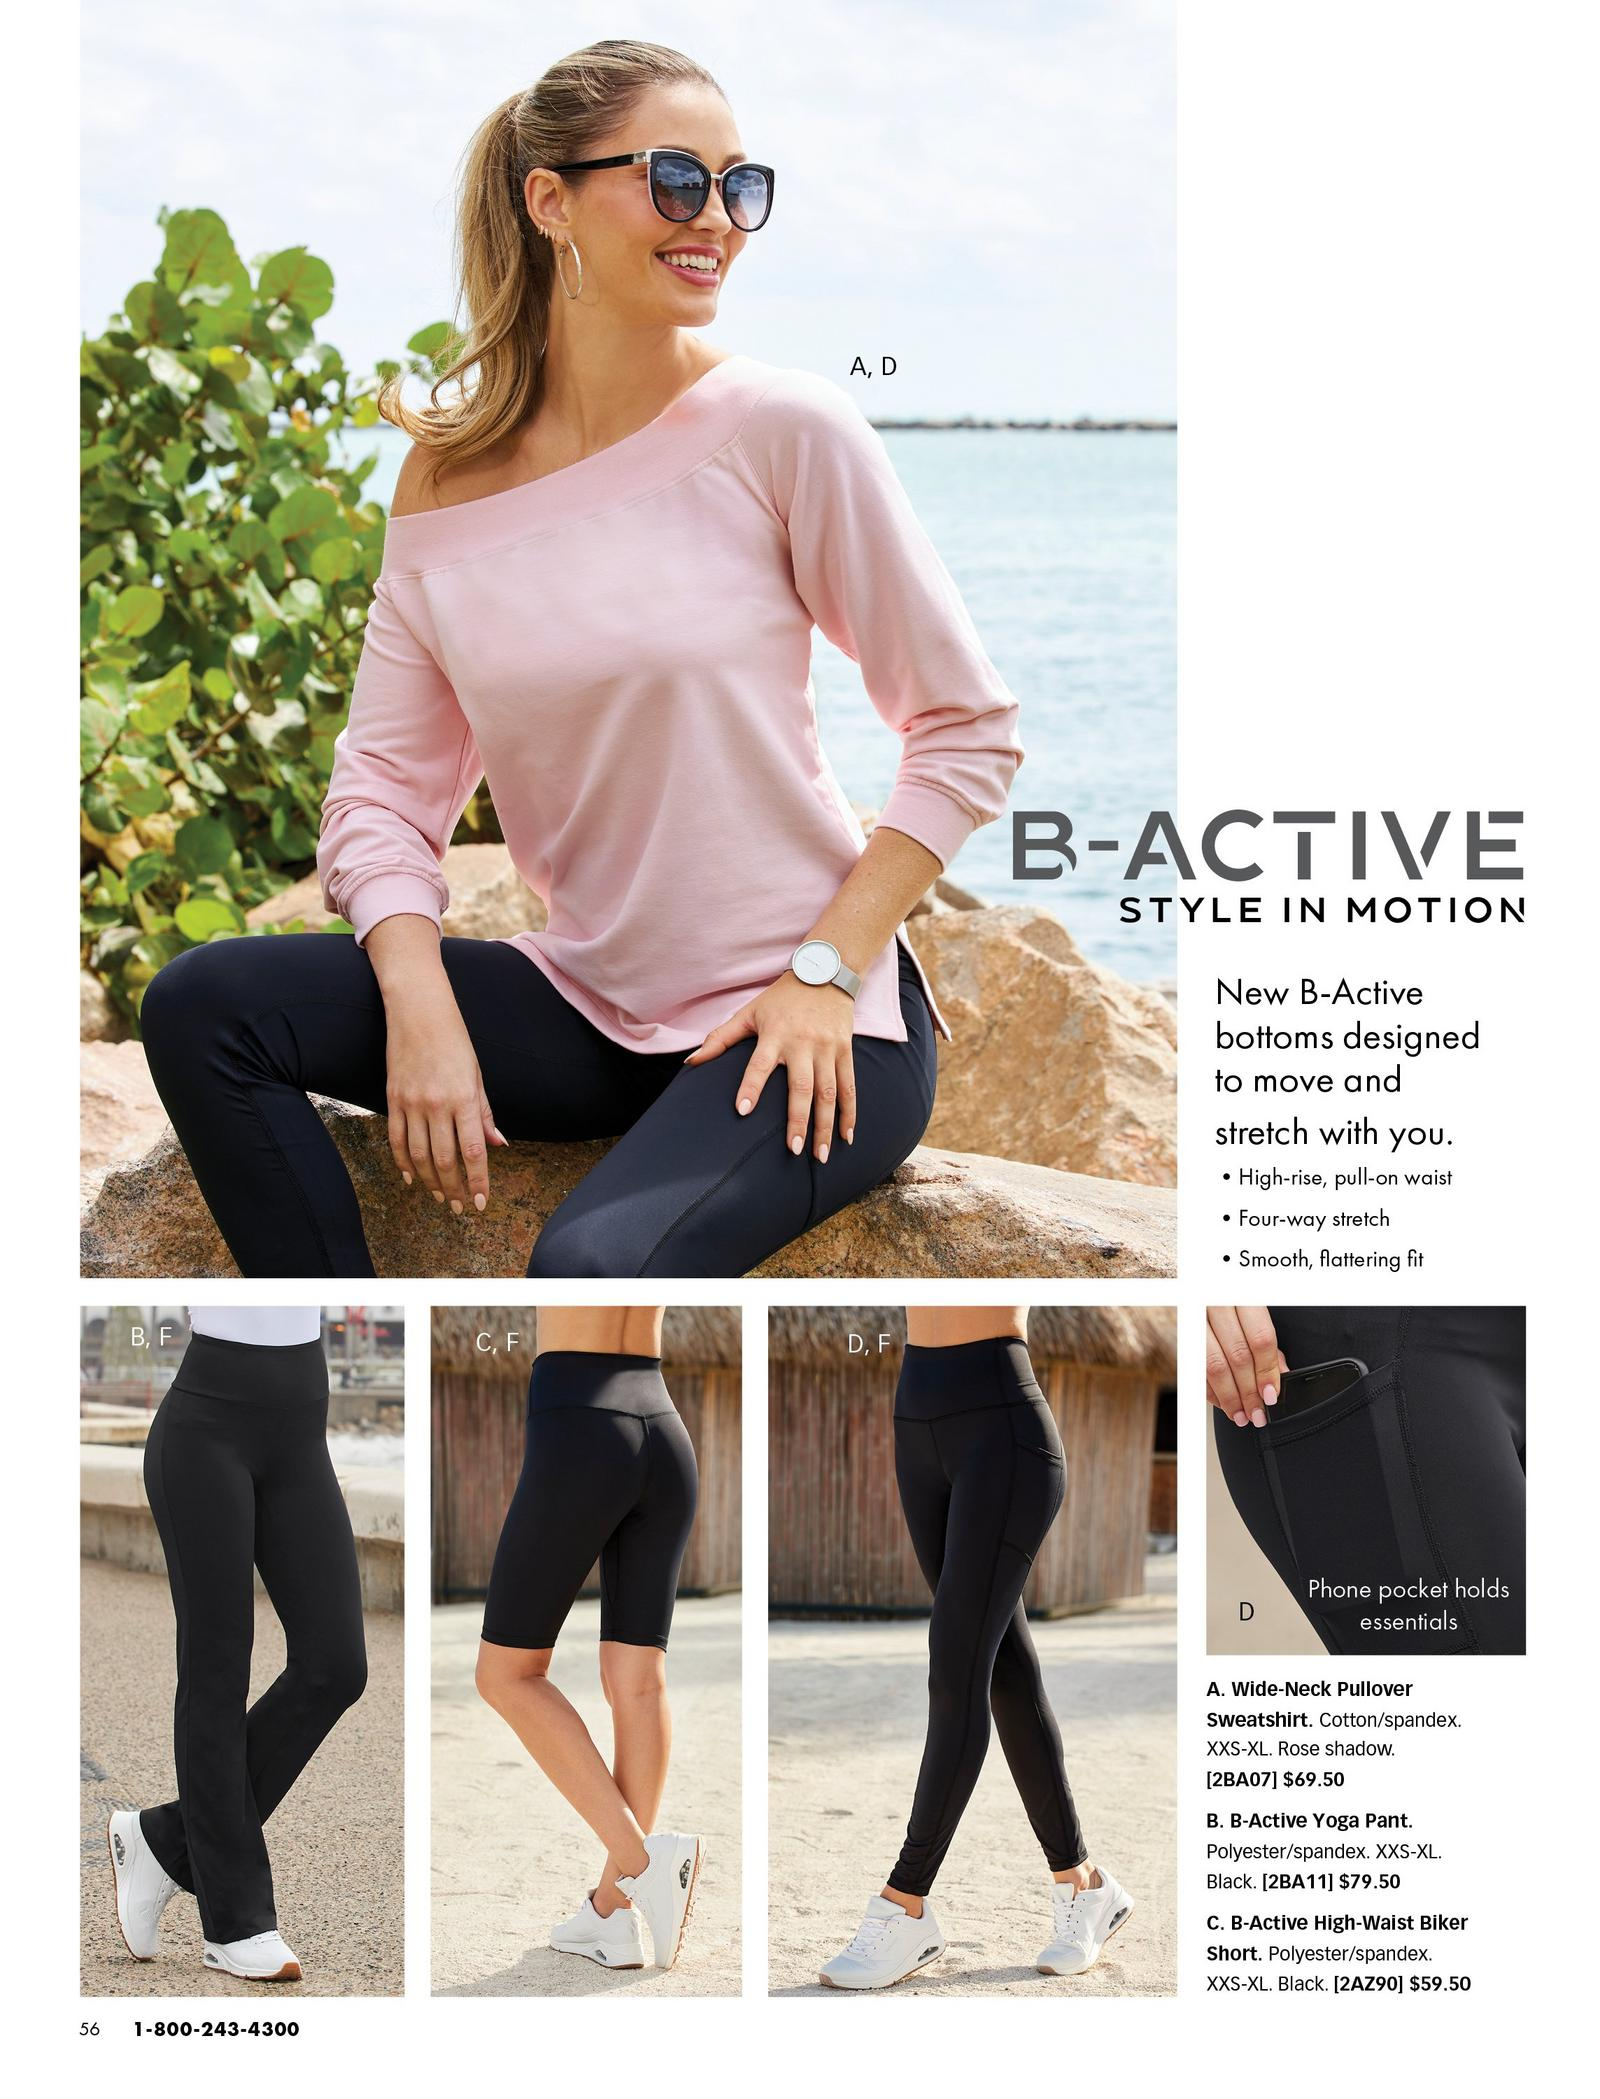 top model wearing a pink off-the-shoulder long-sleeve top, black leggings, and sunglasses. bottom panel left to right: black yoga pants, black biker shorts, black leggings with pockets.